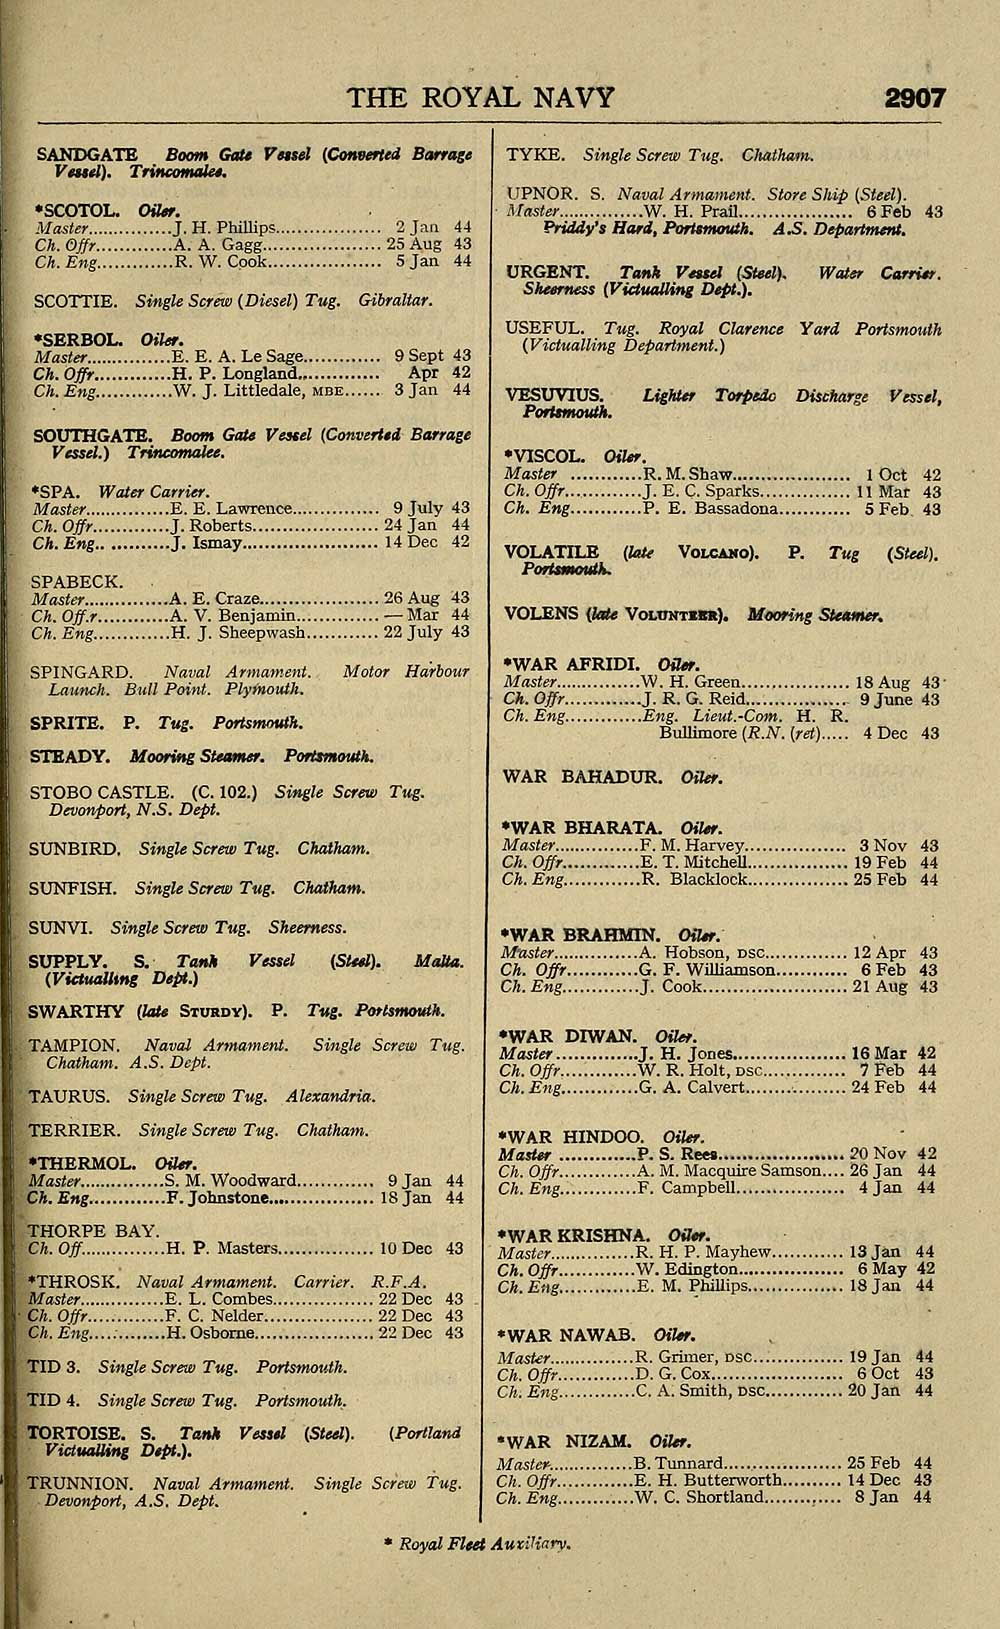 1327) - Navy lists > Bimonthly > 1944 > April > Volume 2